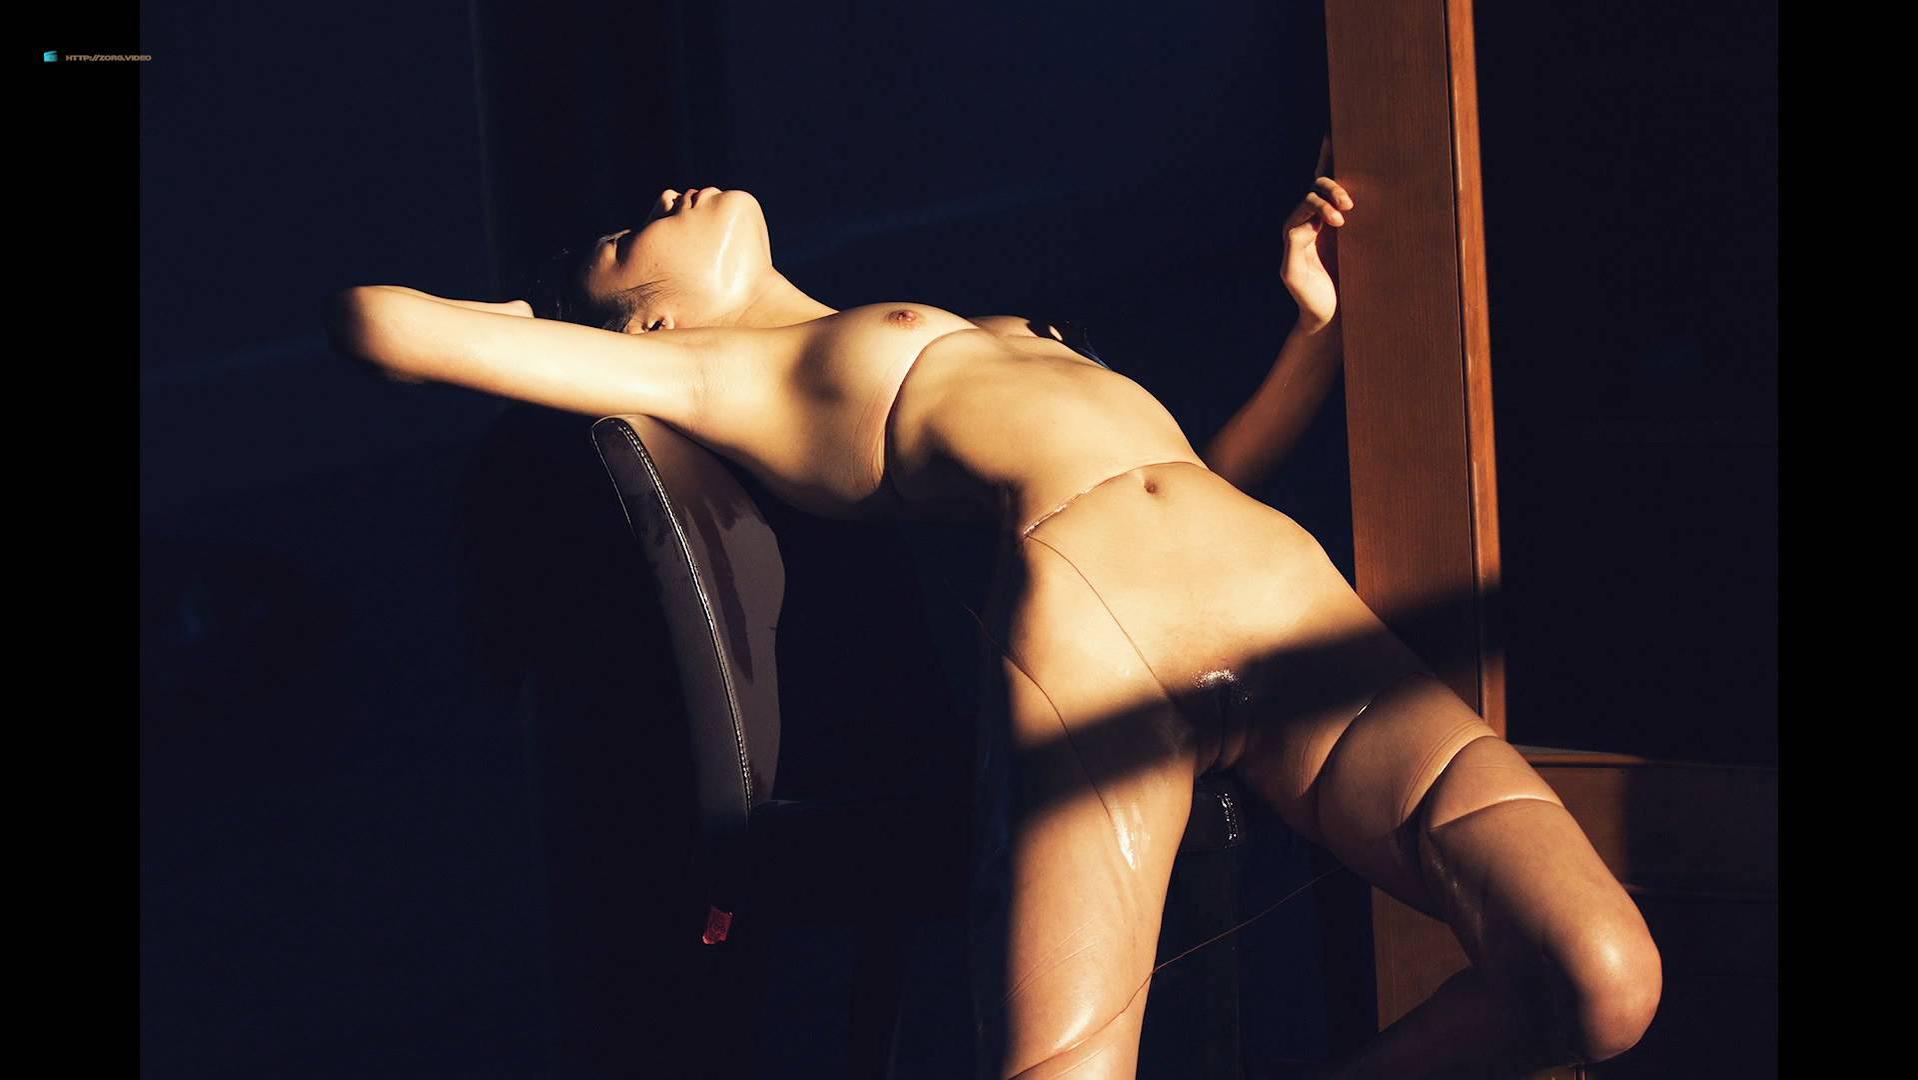 Bianca balti underboob photo